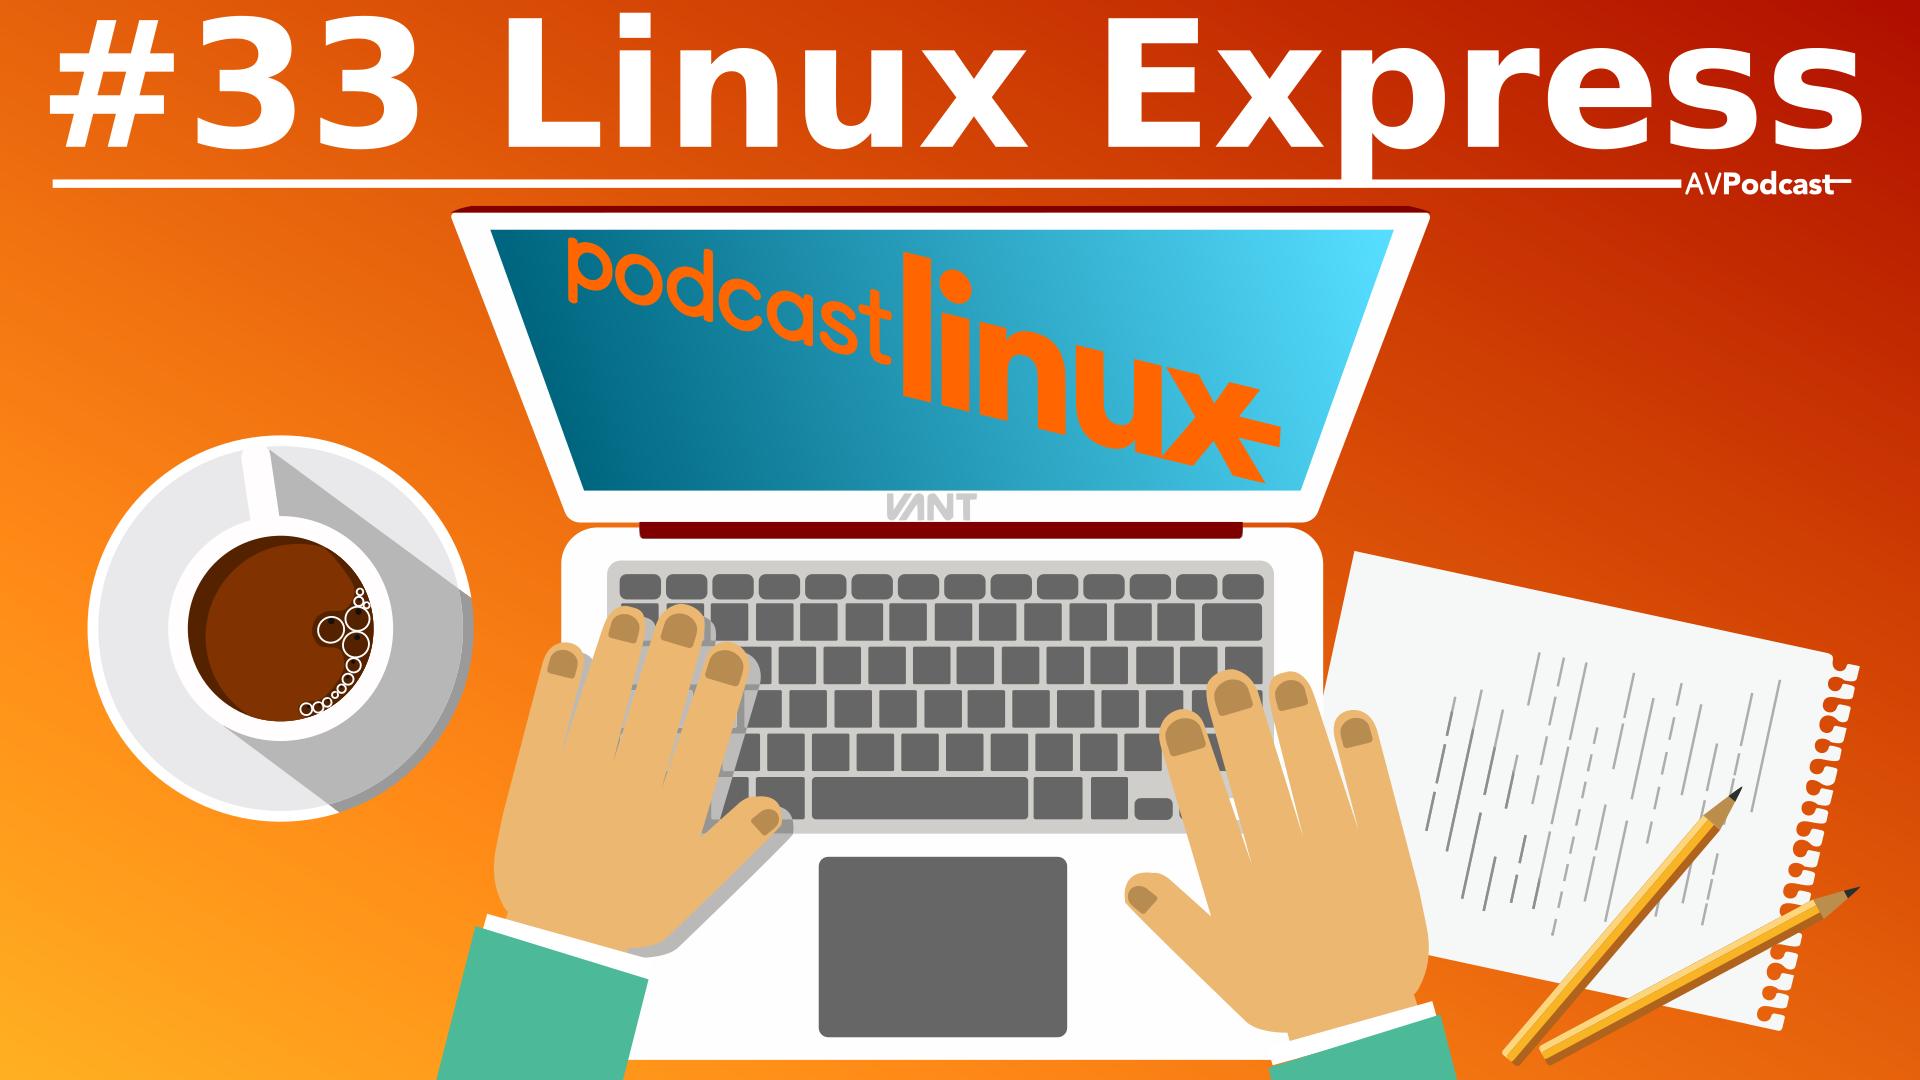 #33 Linux Express